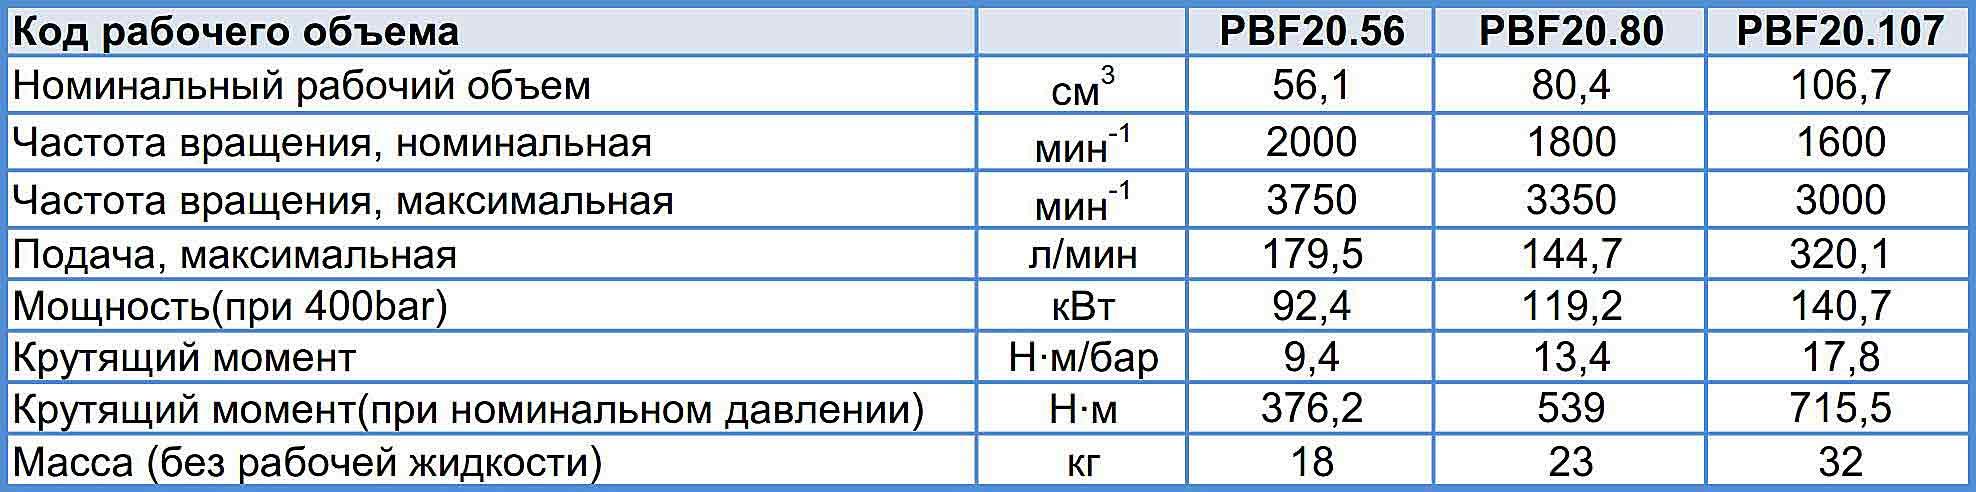 http://www.hydrosila.com/files/content/Image/APM_2014/1111/PBF20_ru.jpg